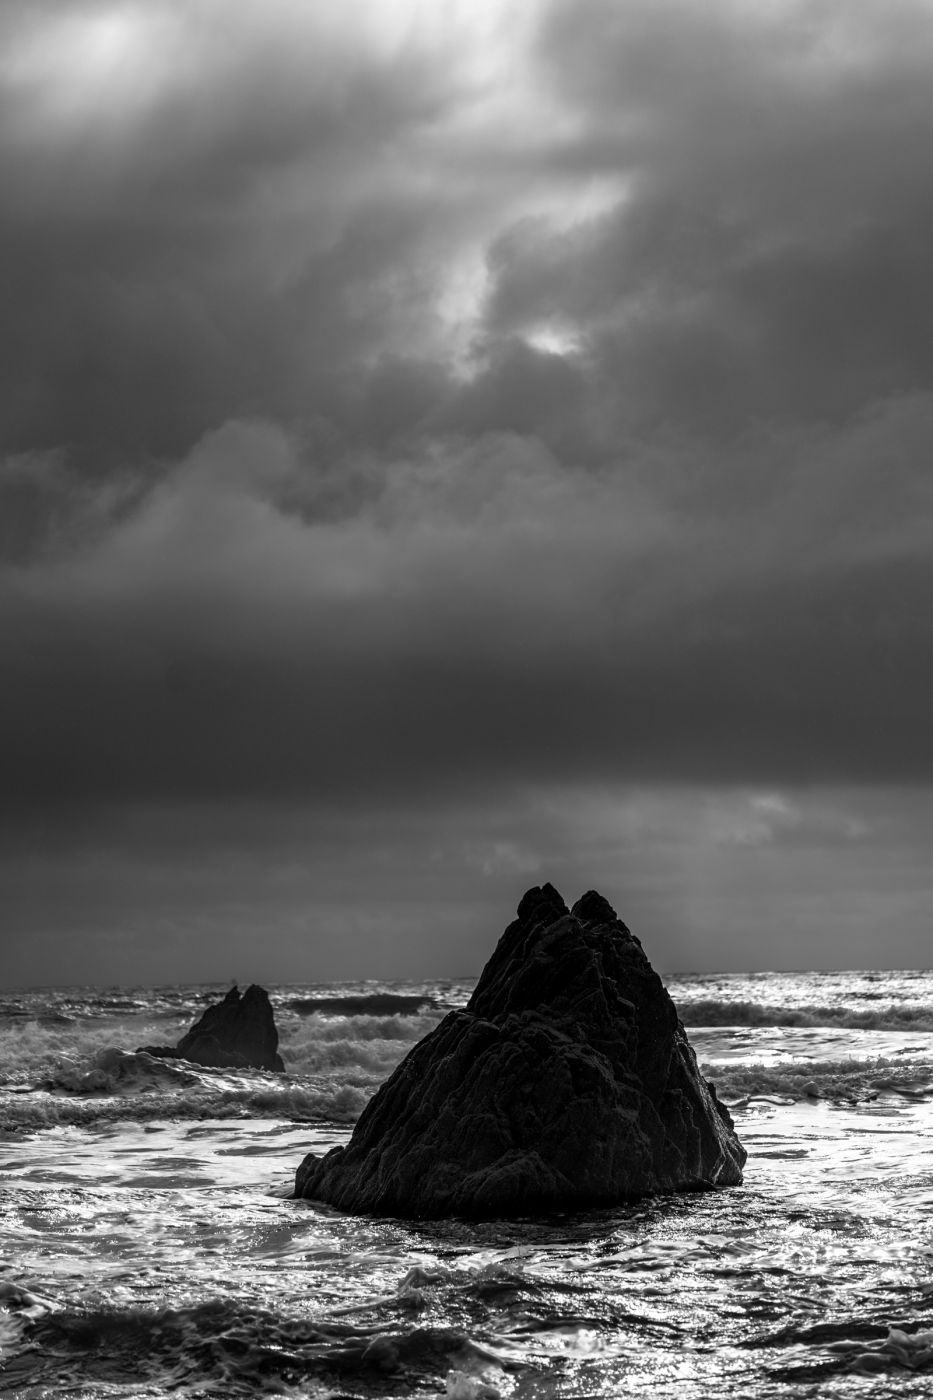 Marloes Sands, United Kingdom